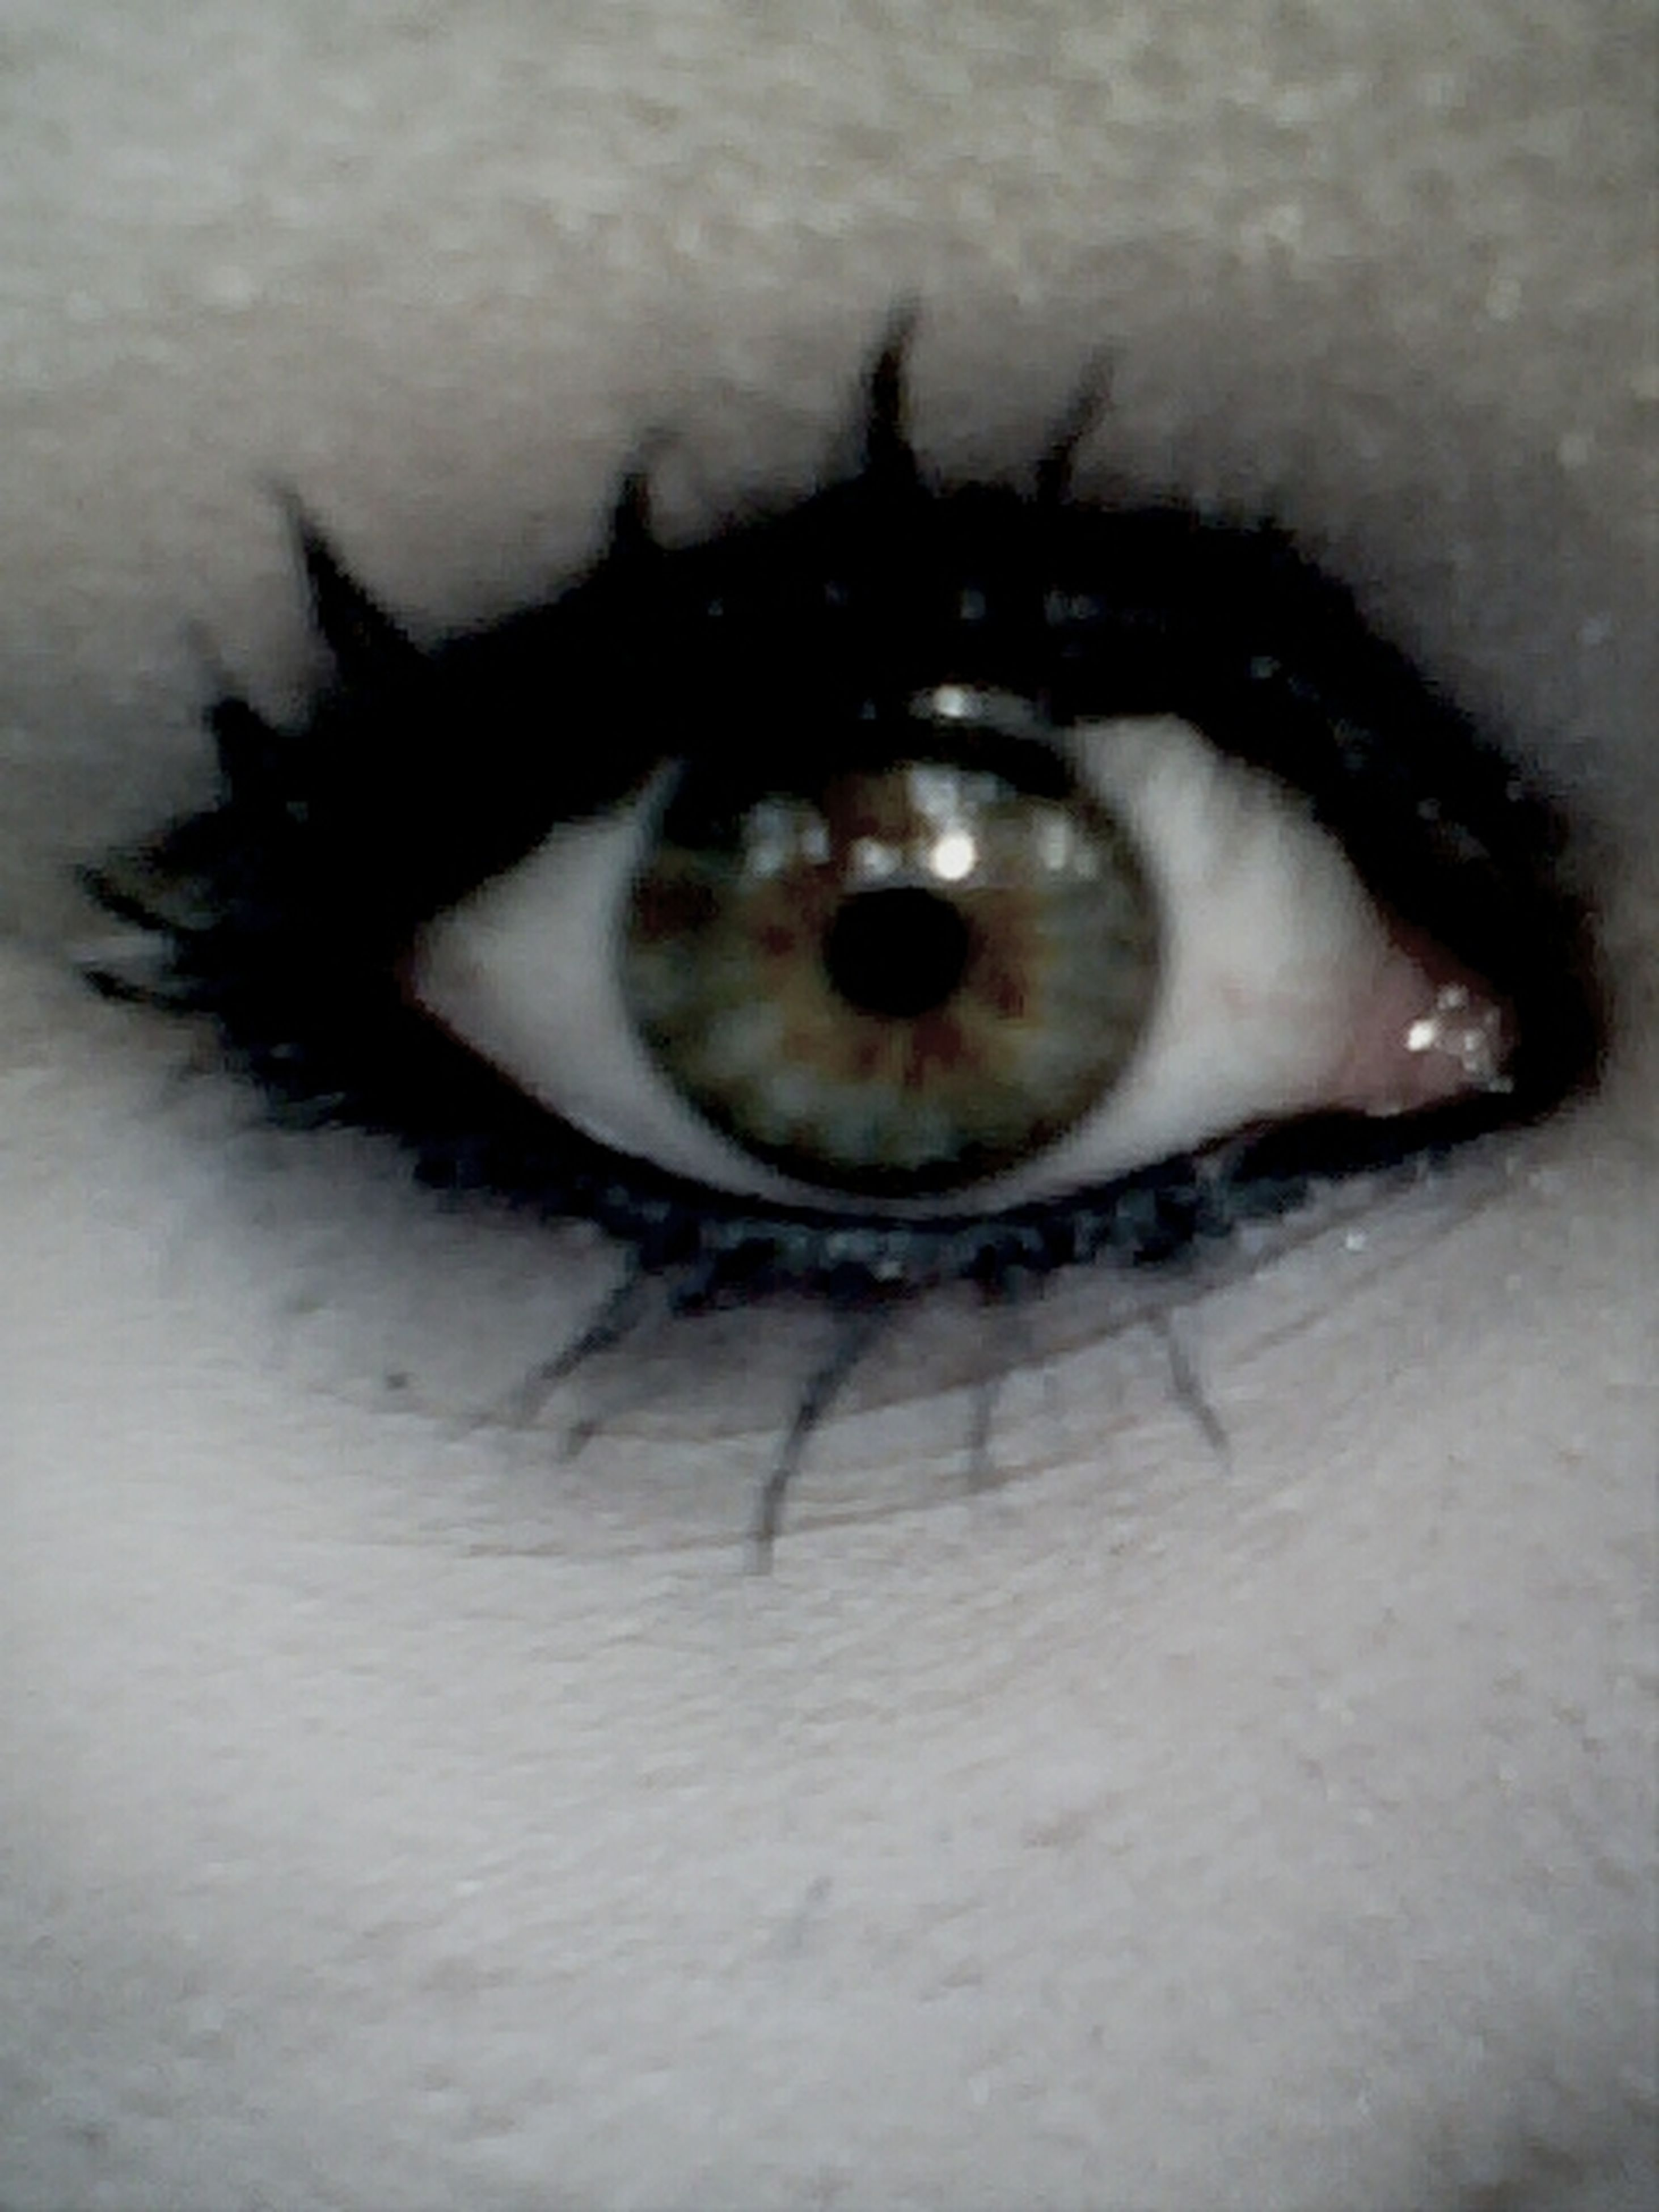 human eye, indoors, close-up, eyesight, eyelash, sensory perception, looking at camera, reflection, portrait, extreme close-up, eyeball, part of, iris - eye, unrecognizable person, high angle view, lifestyles, vision